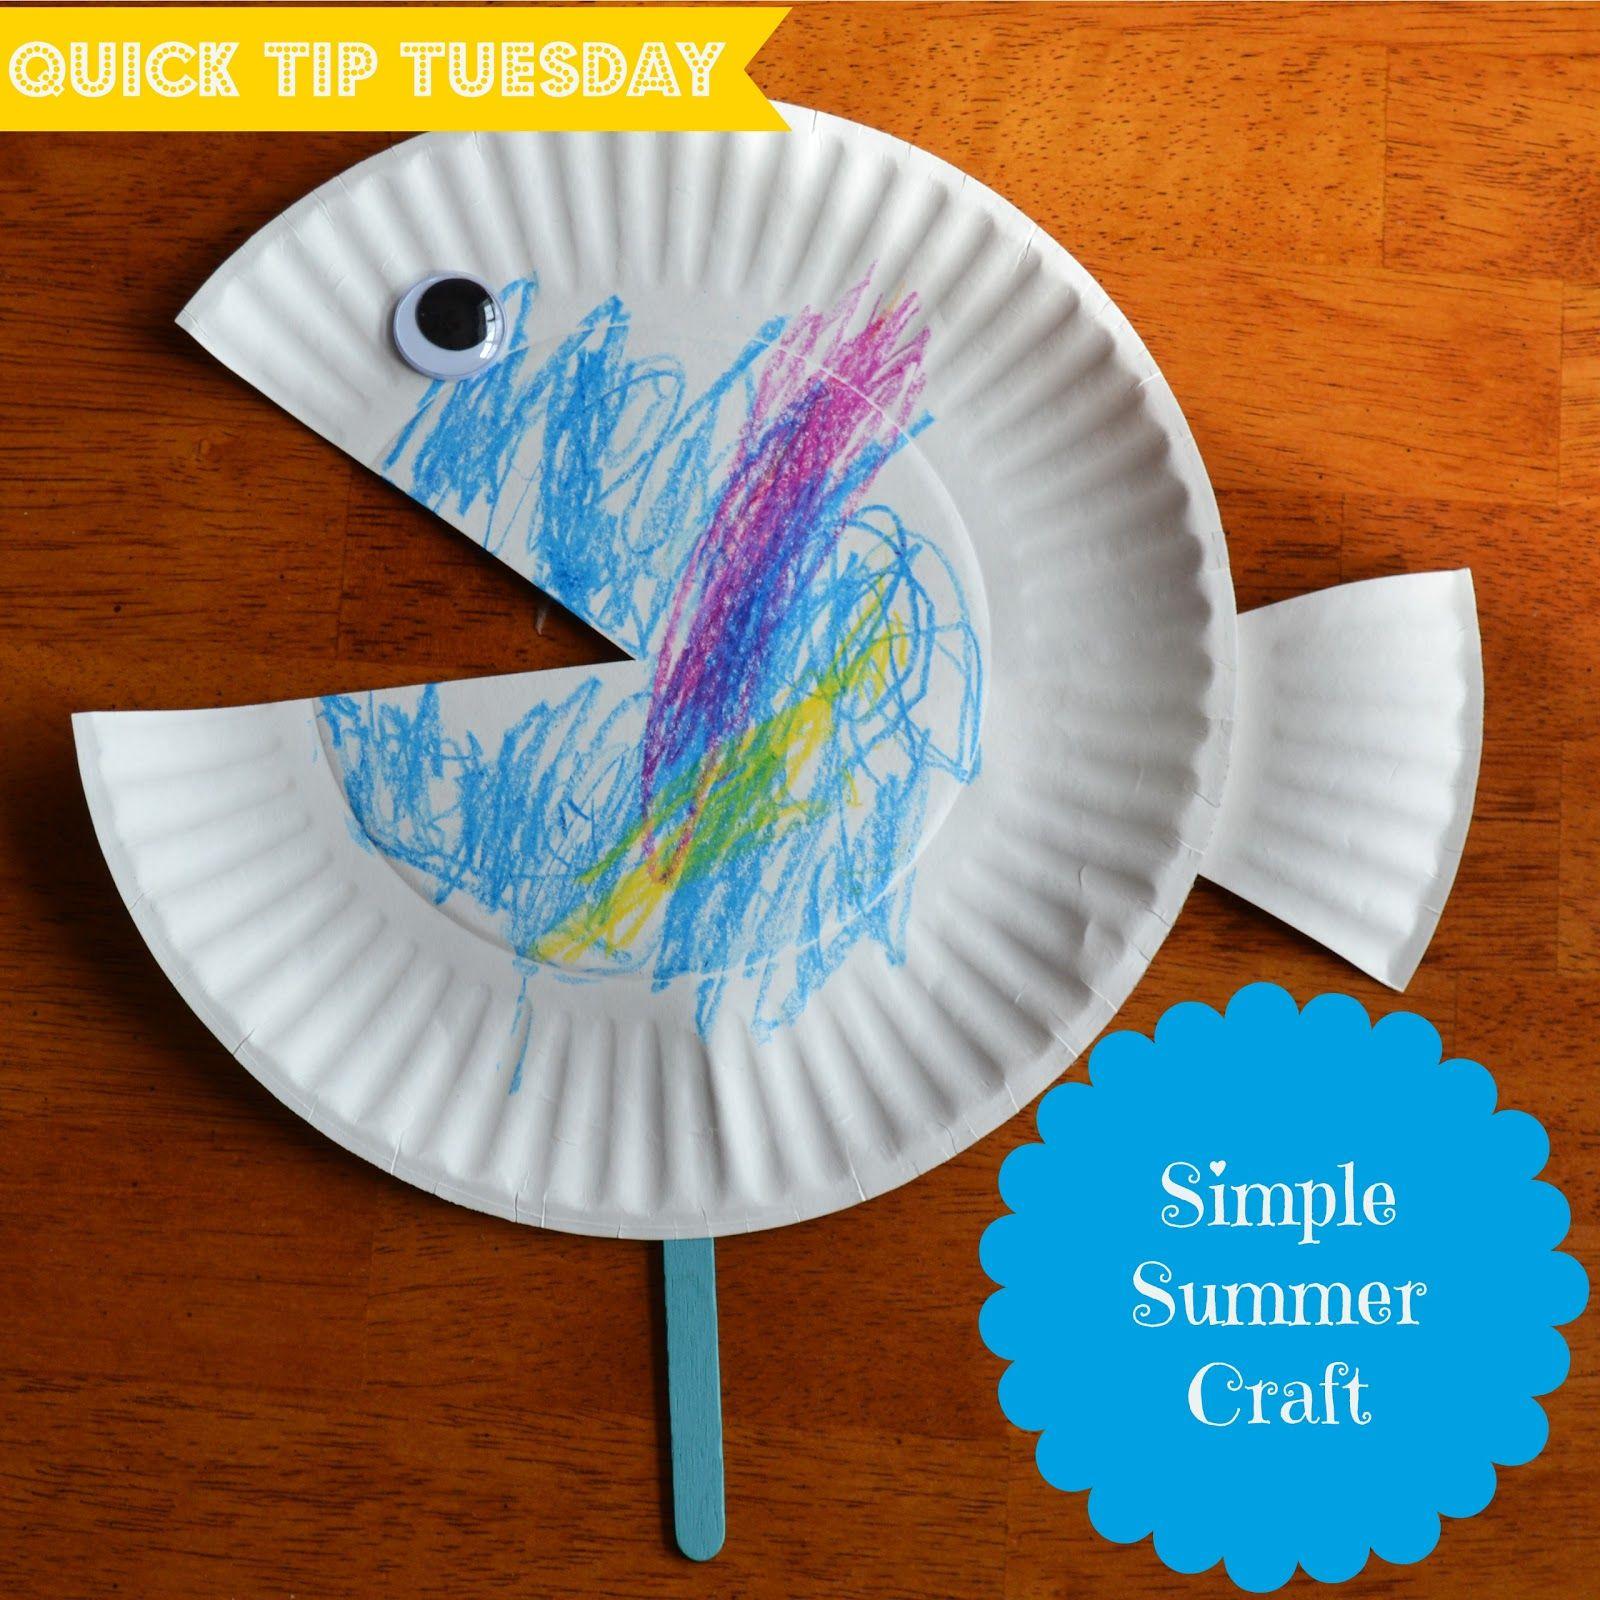 Simple Summer Craft